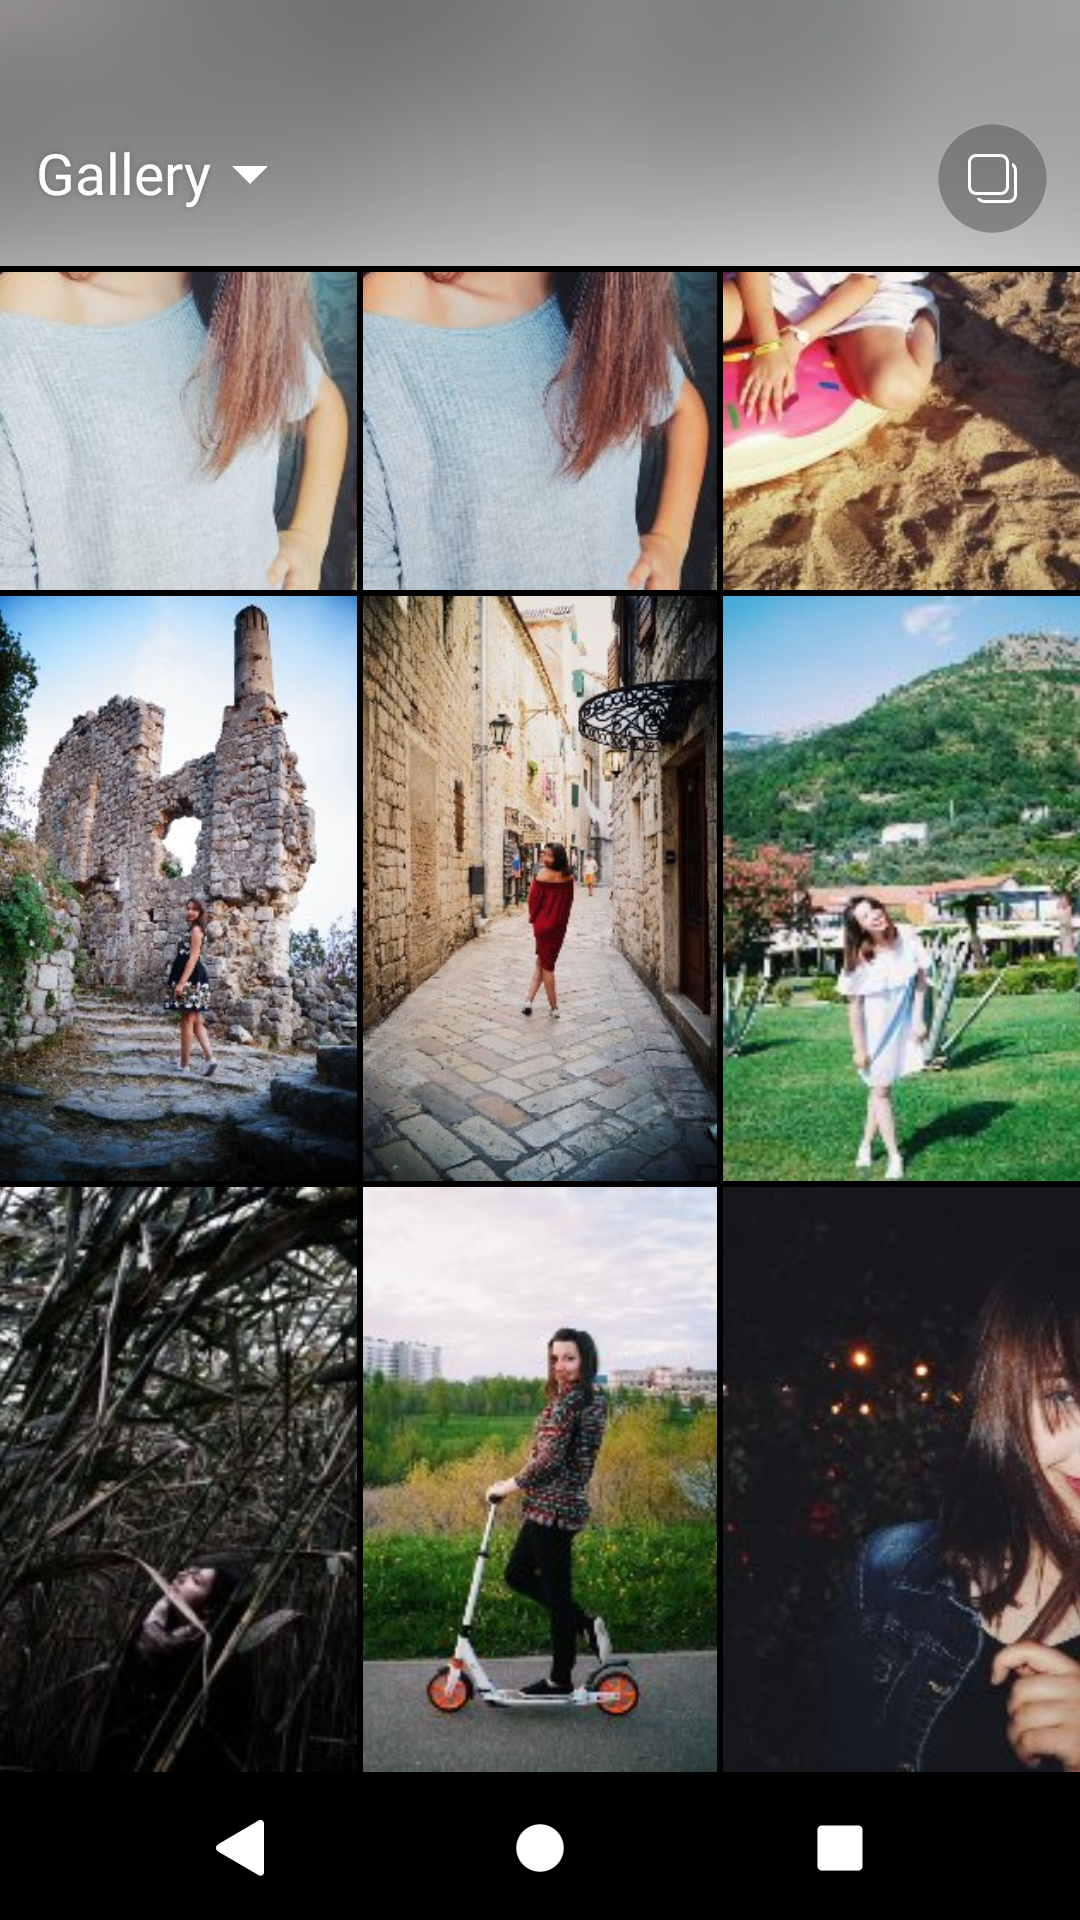 Instagram Gallery of your phone